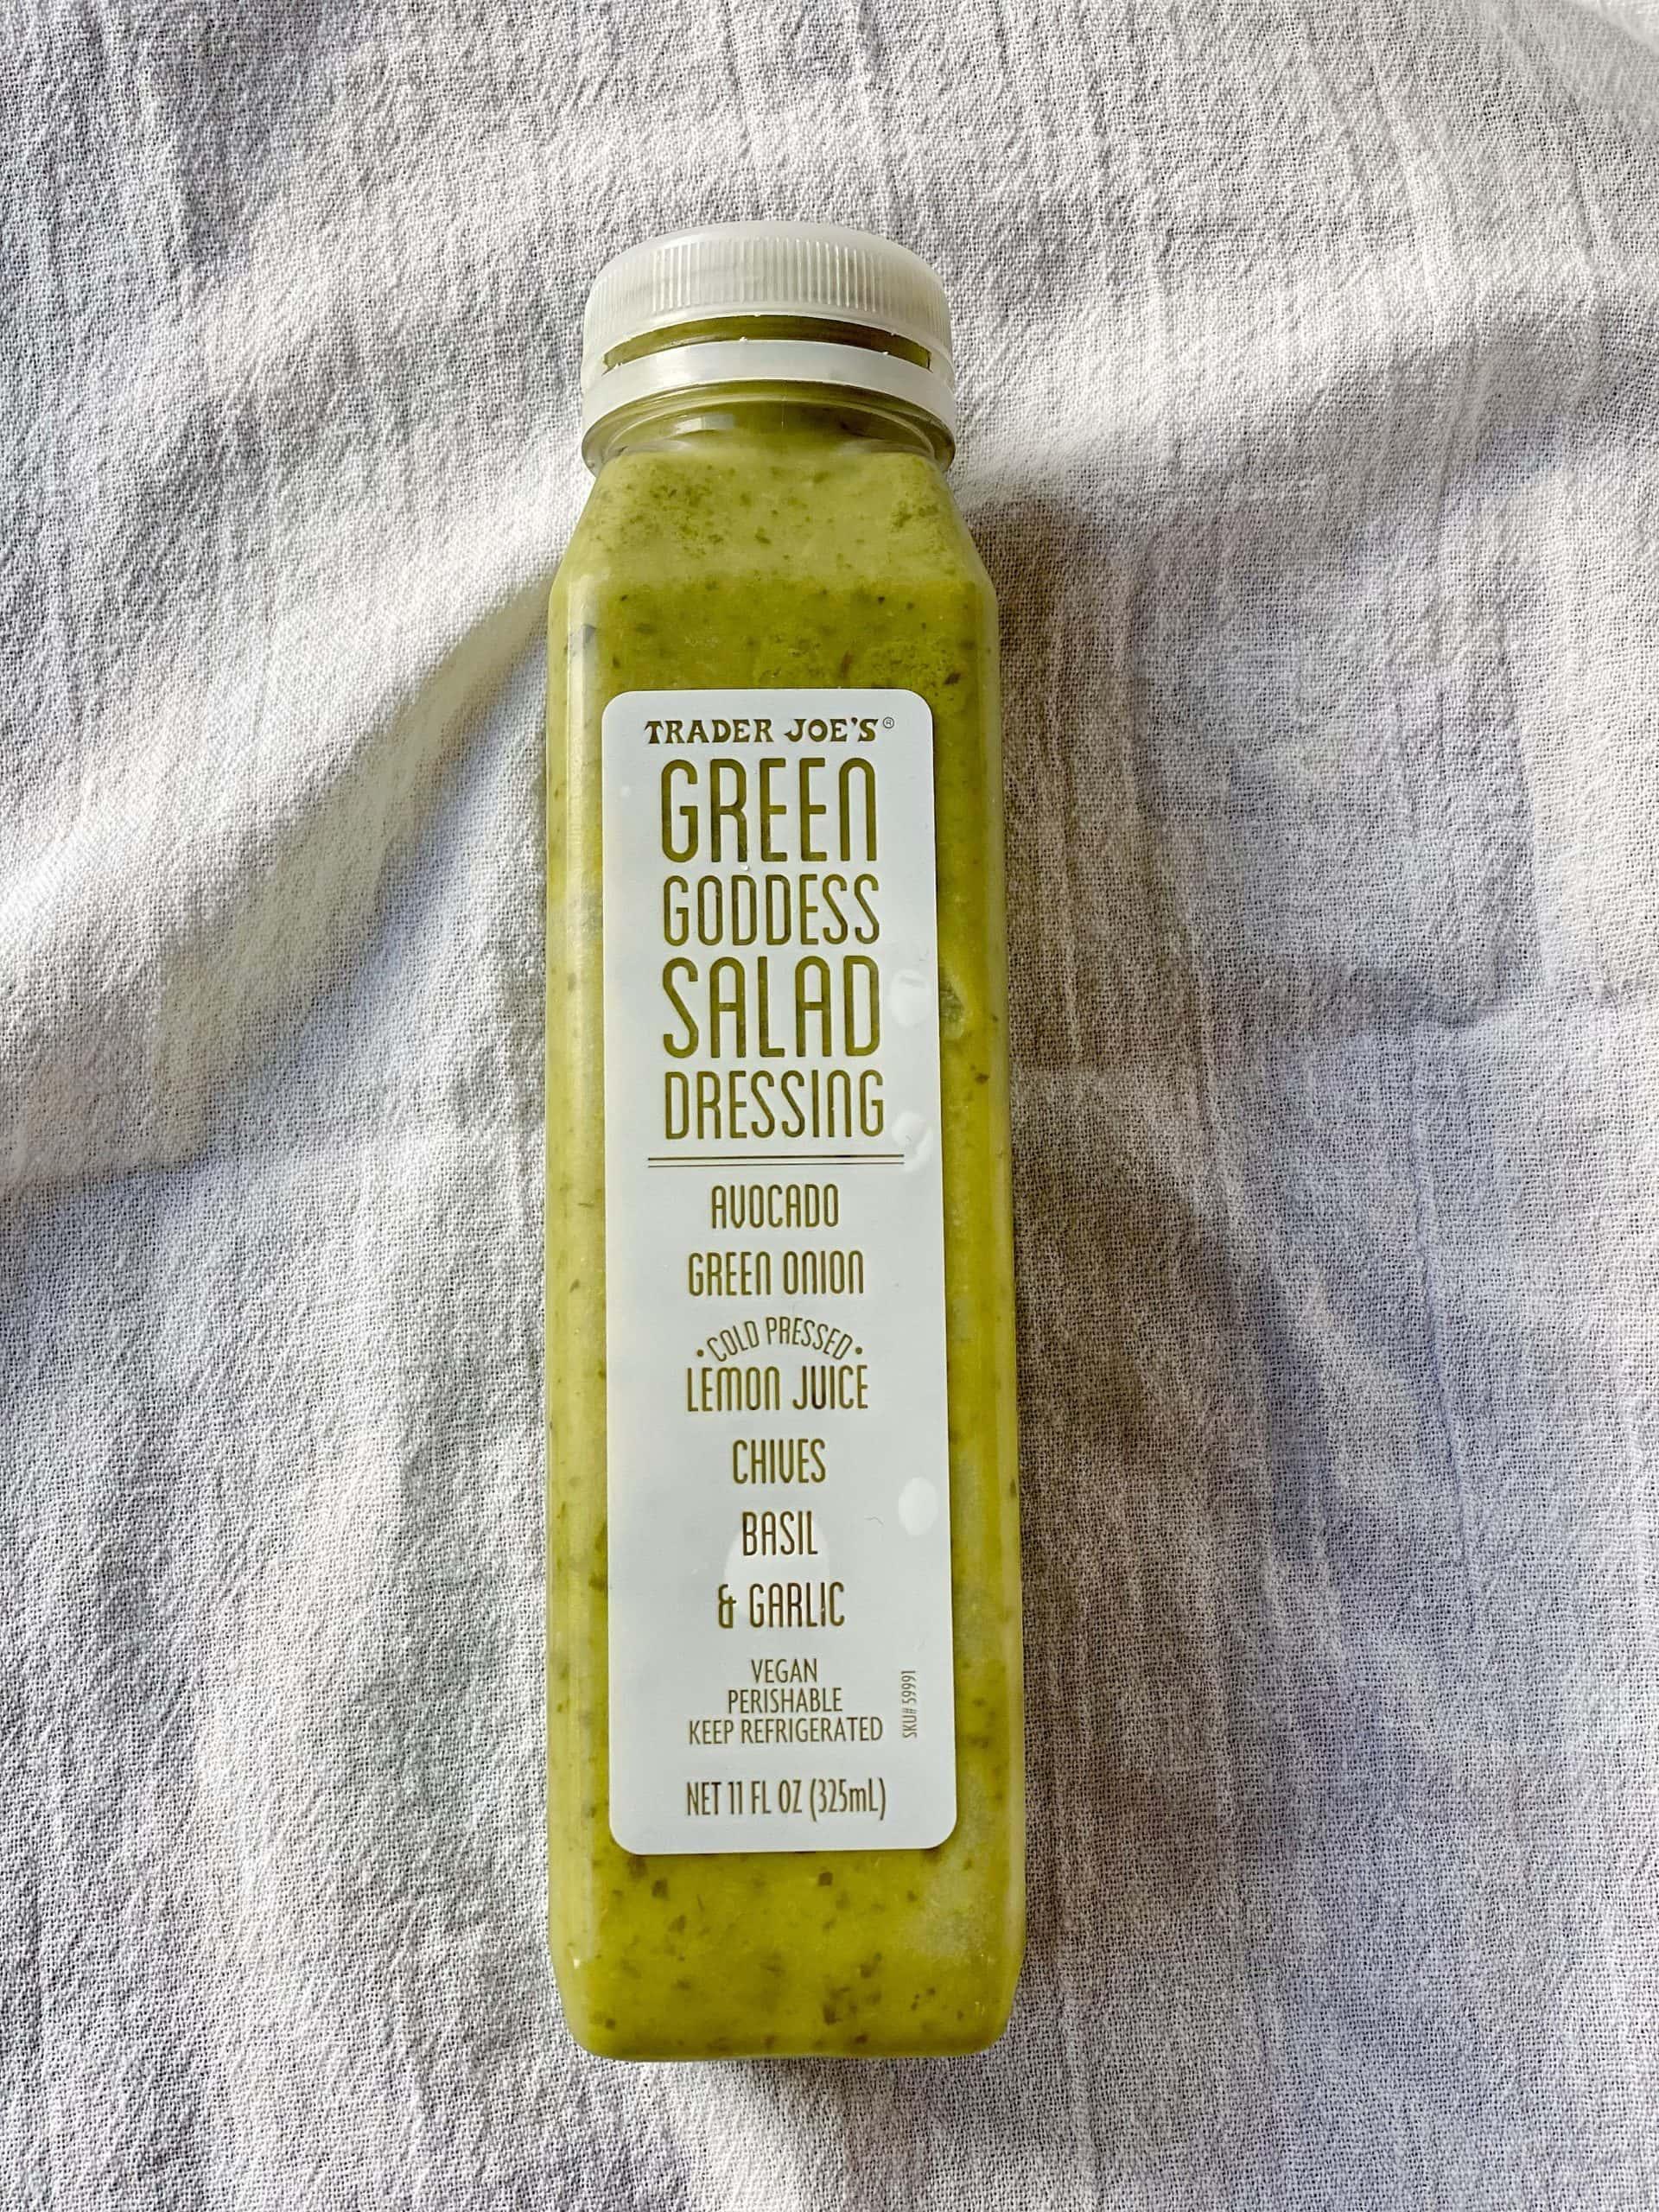 Green Goddess Salad Dressing from Trader Joe's. The Best Foods to Buy at Trader Joe's.